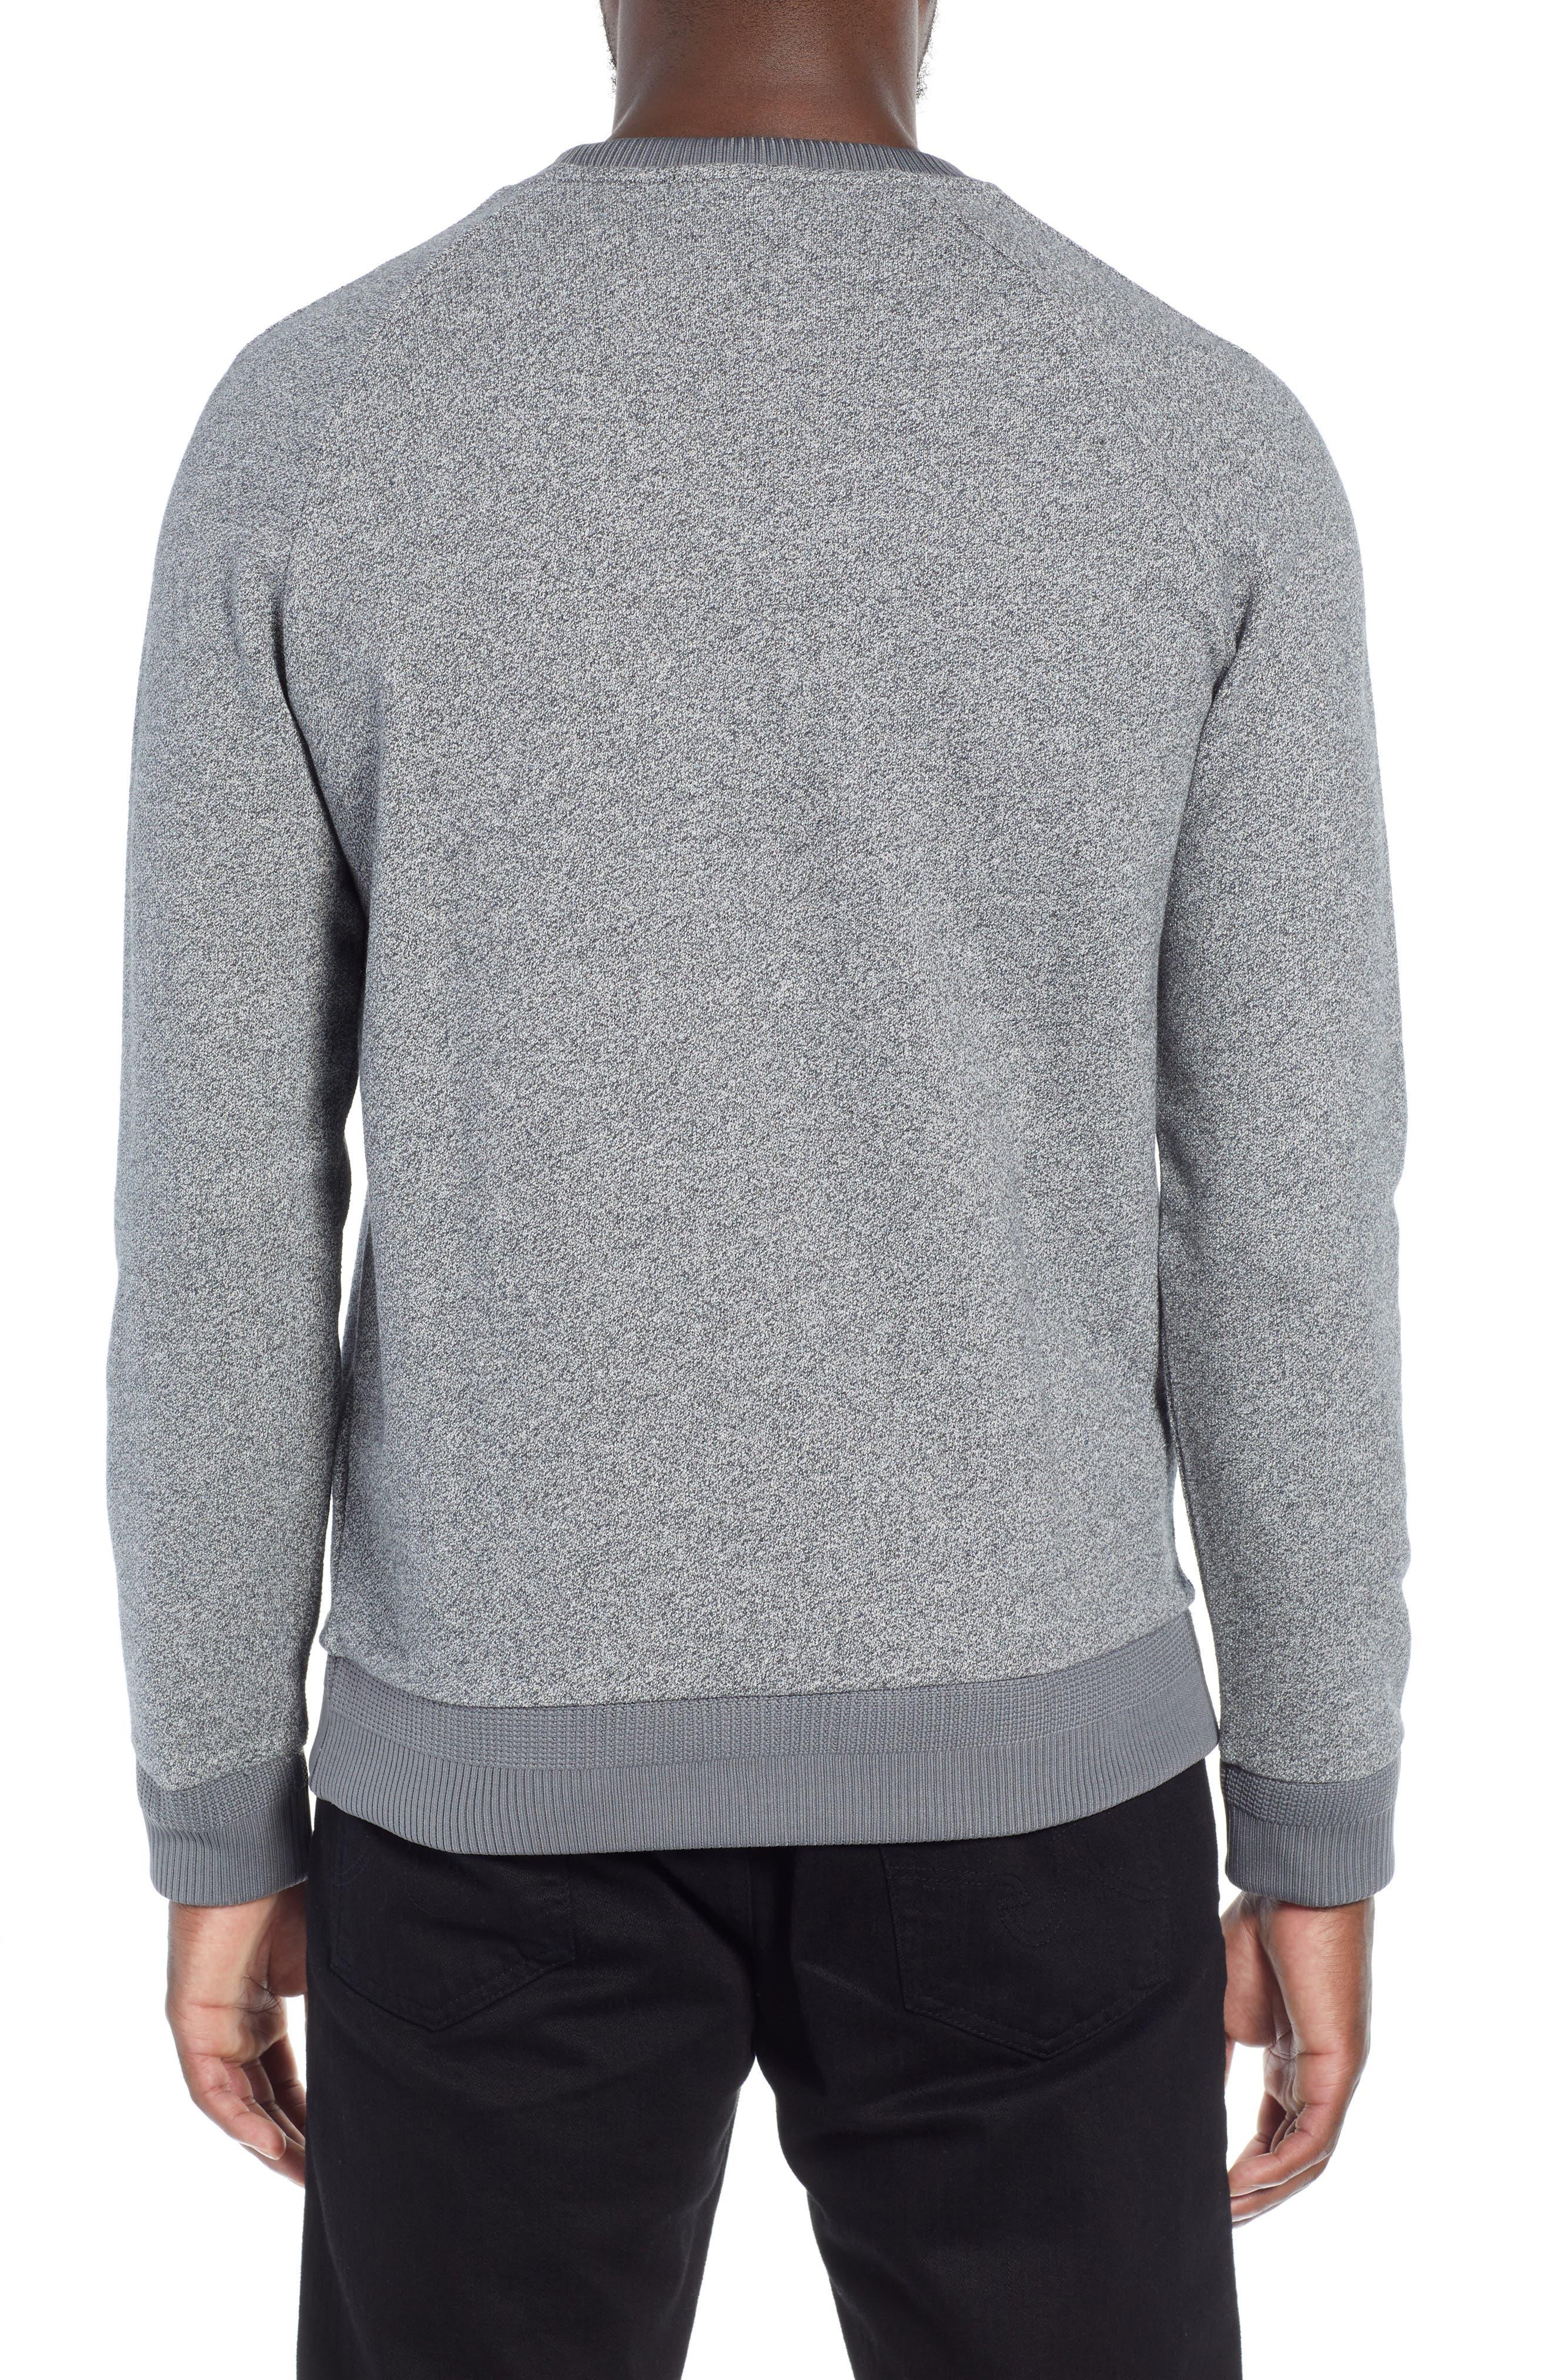 Stadler Denimic Regular Fit Sweatshirt,                             Alternate thumbnail 2, color,                             GREY